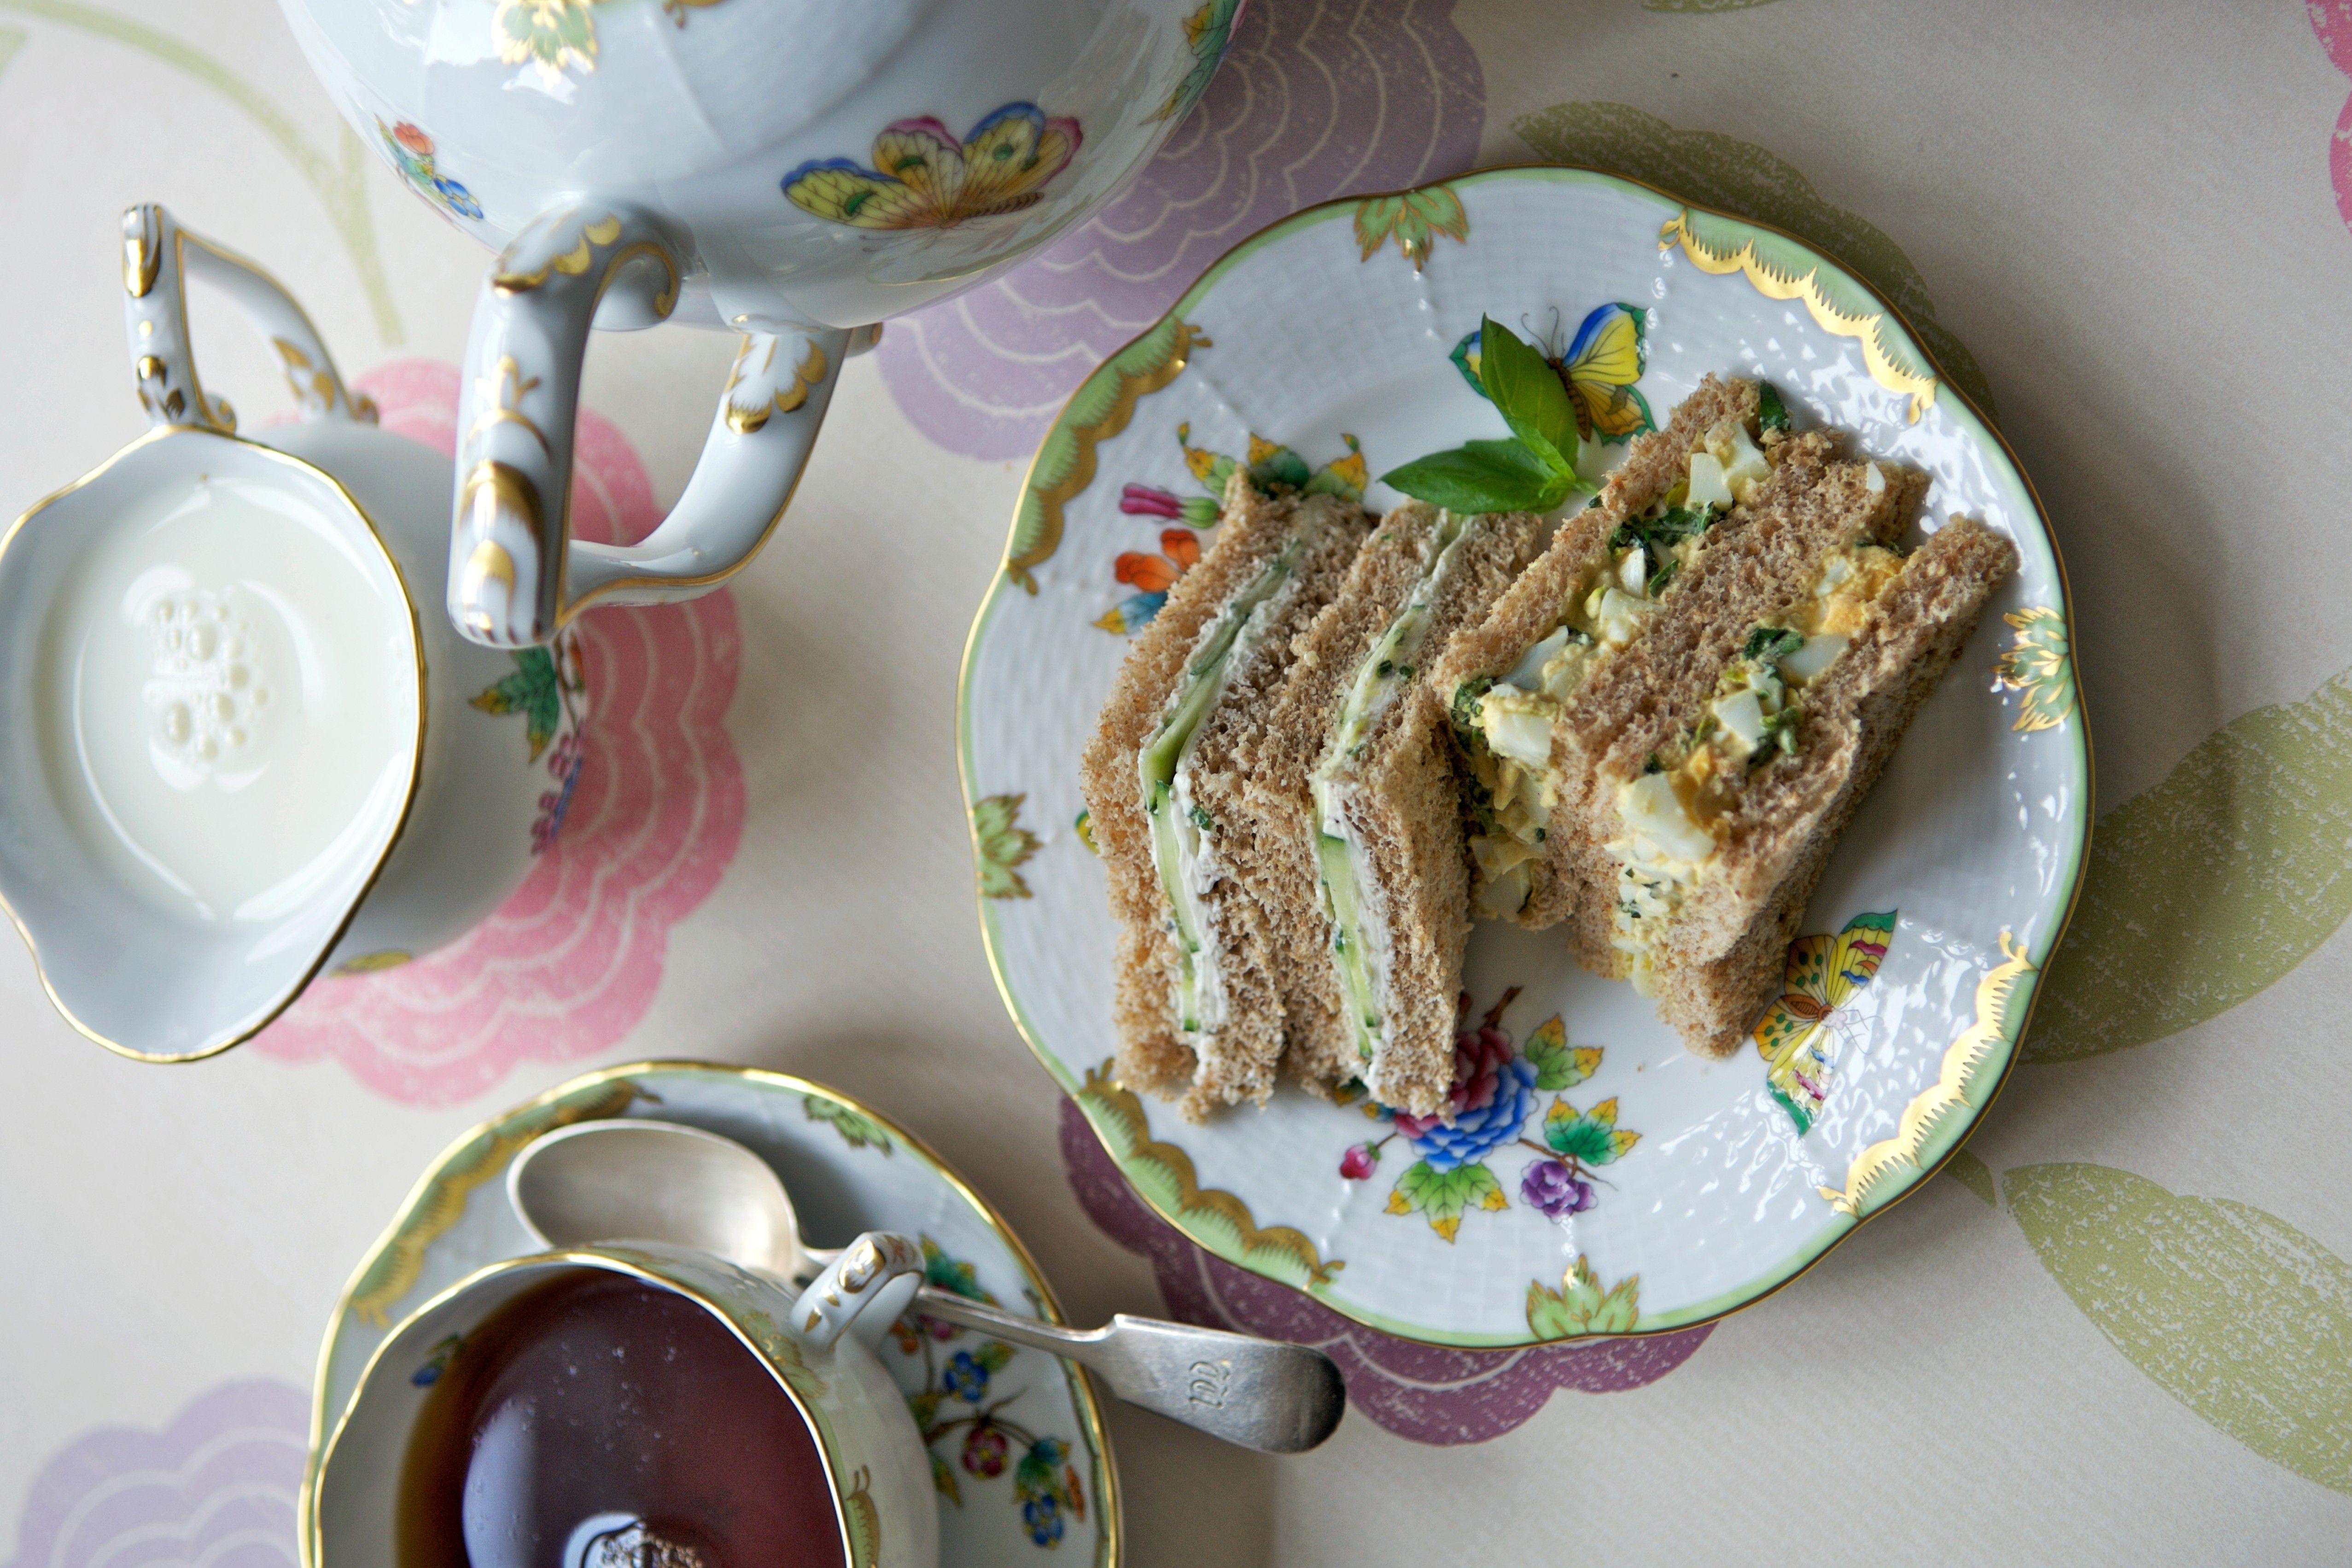 Veggie cream cheese finger sandwhiches served with tea